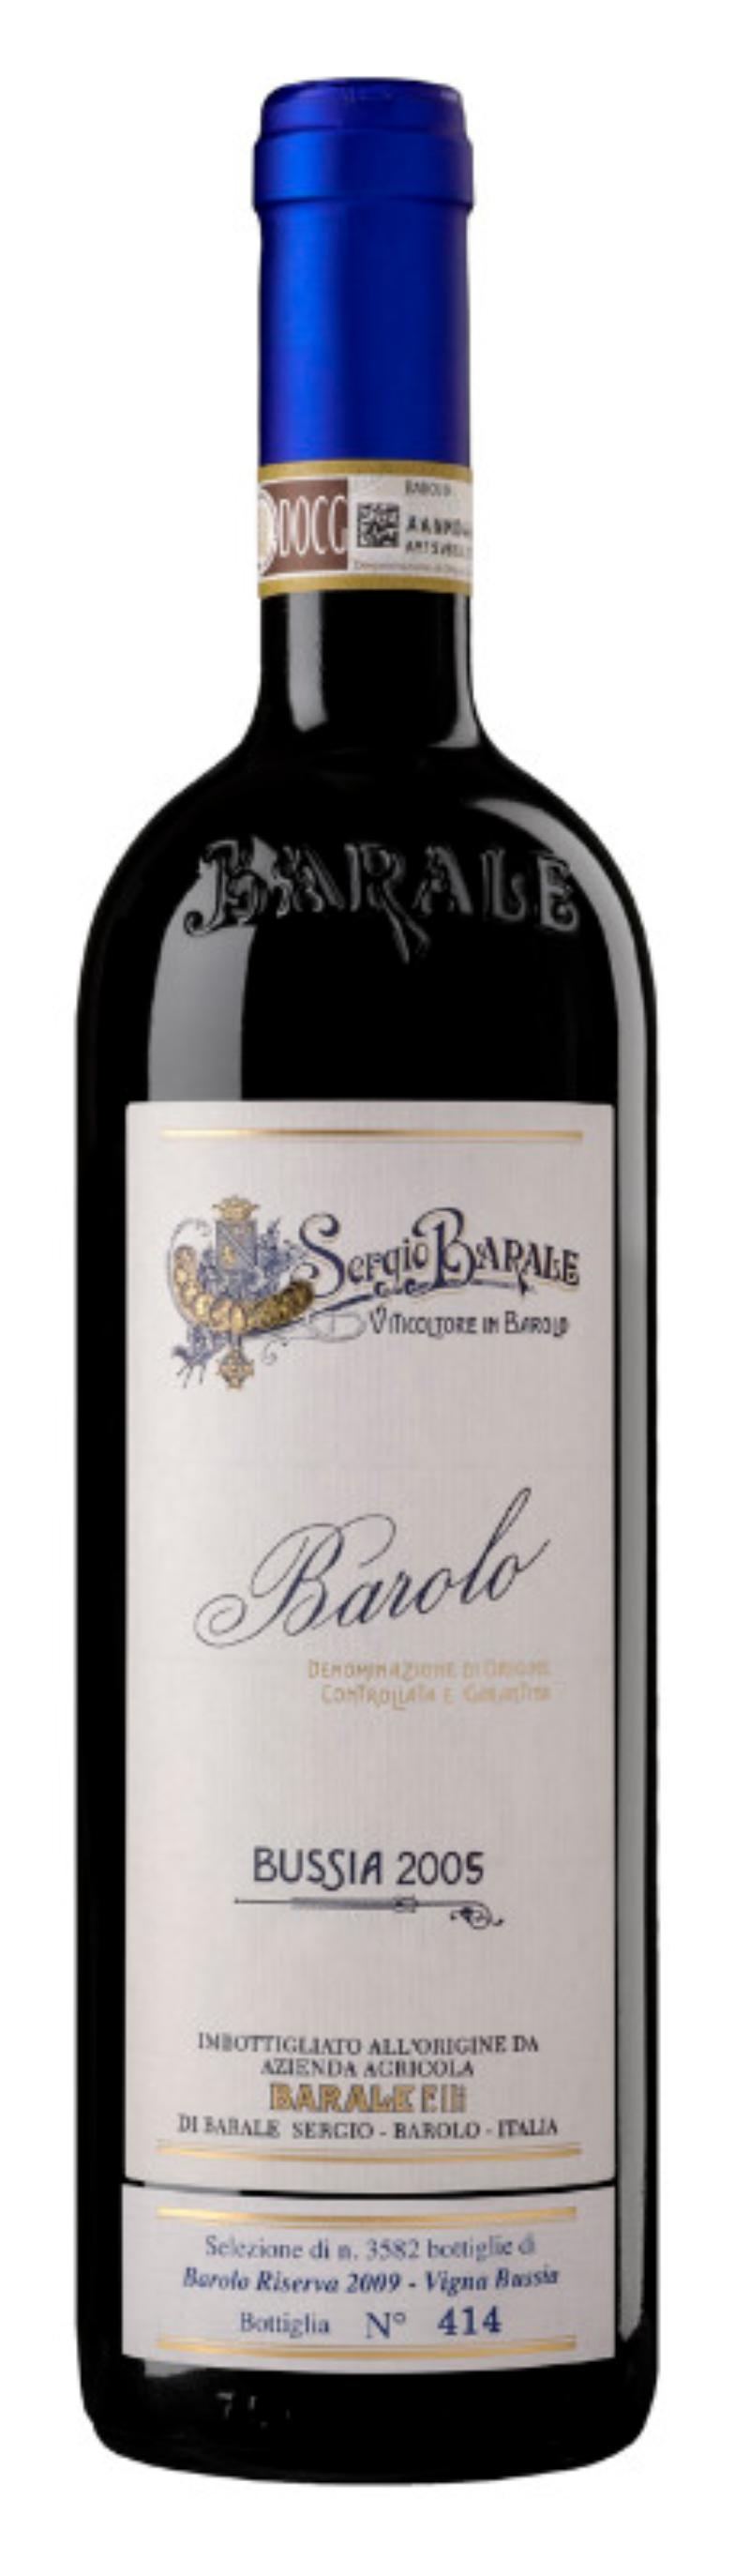 BAROLO-BUSSIA-BARALE-2005-0.75